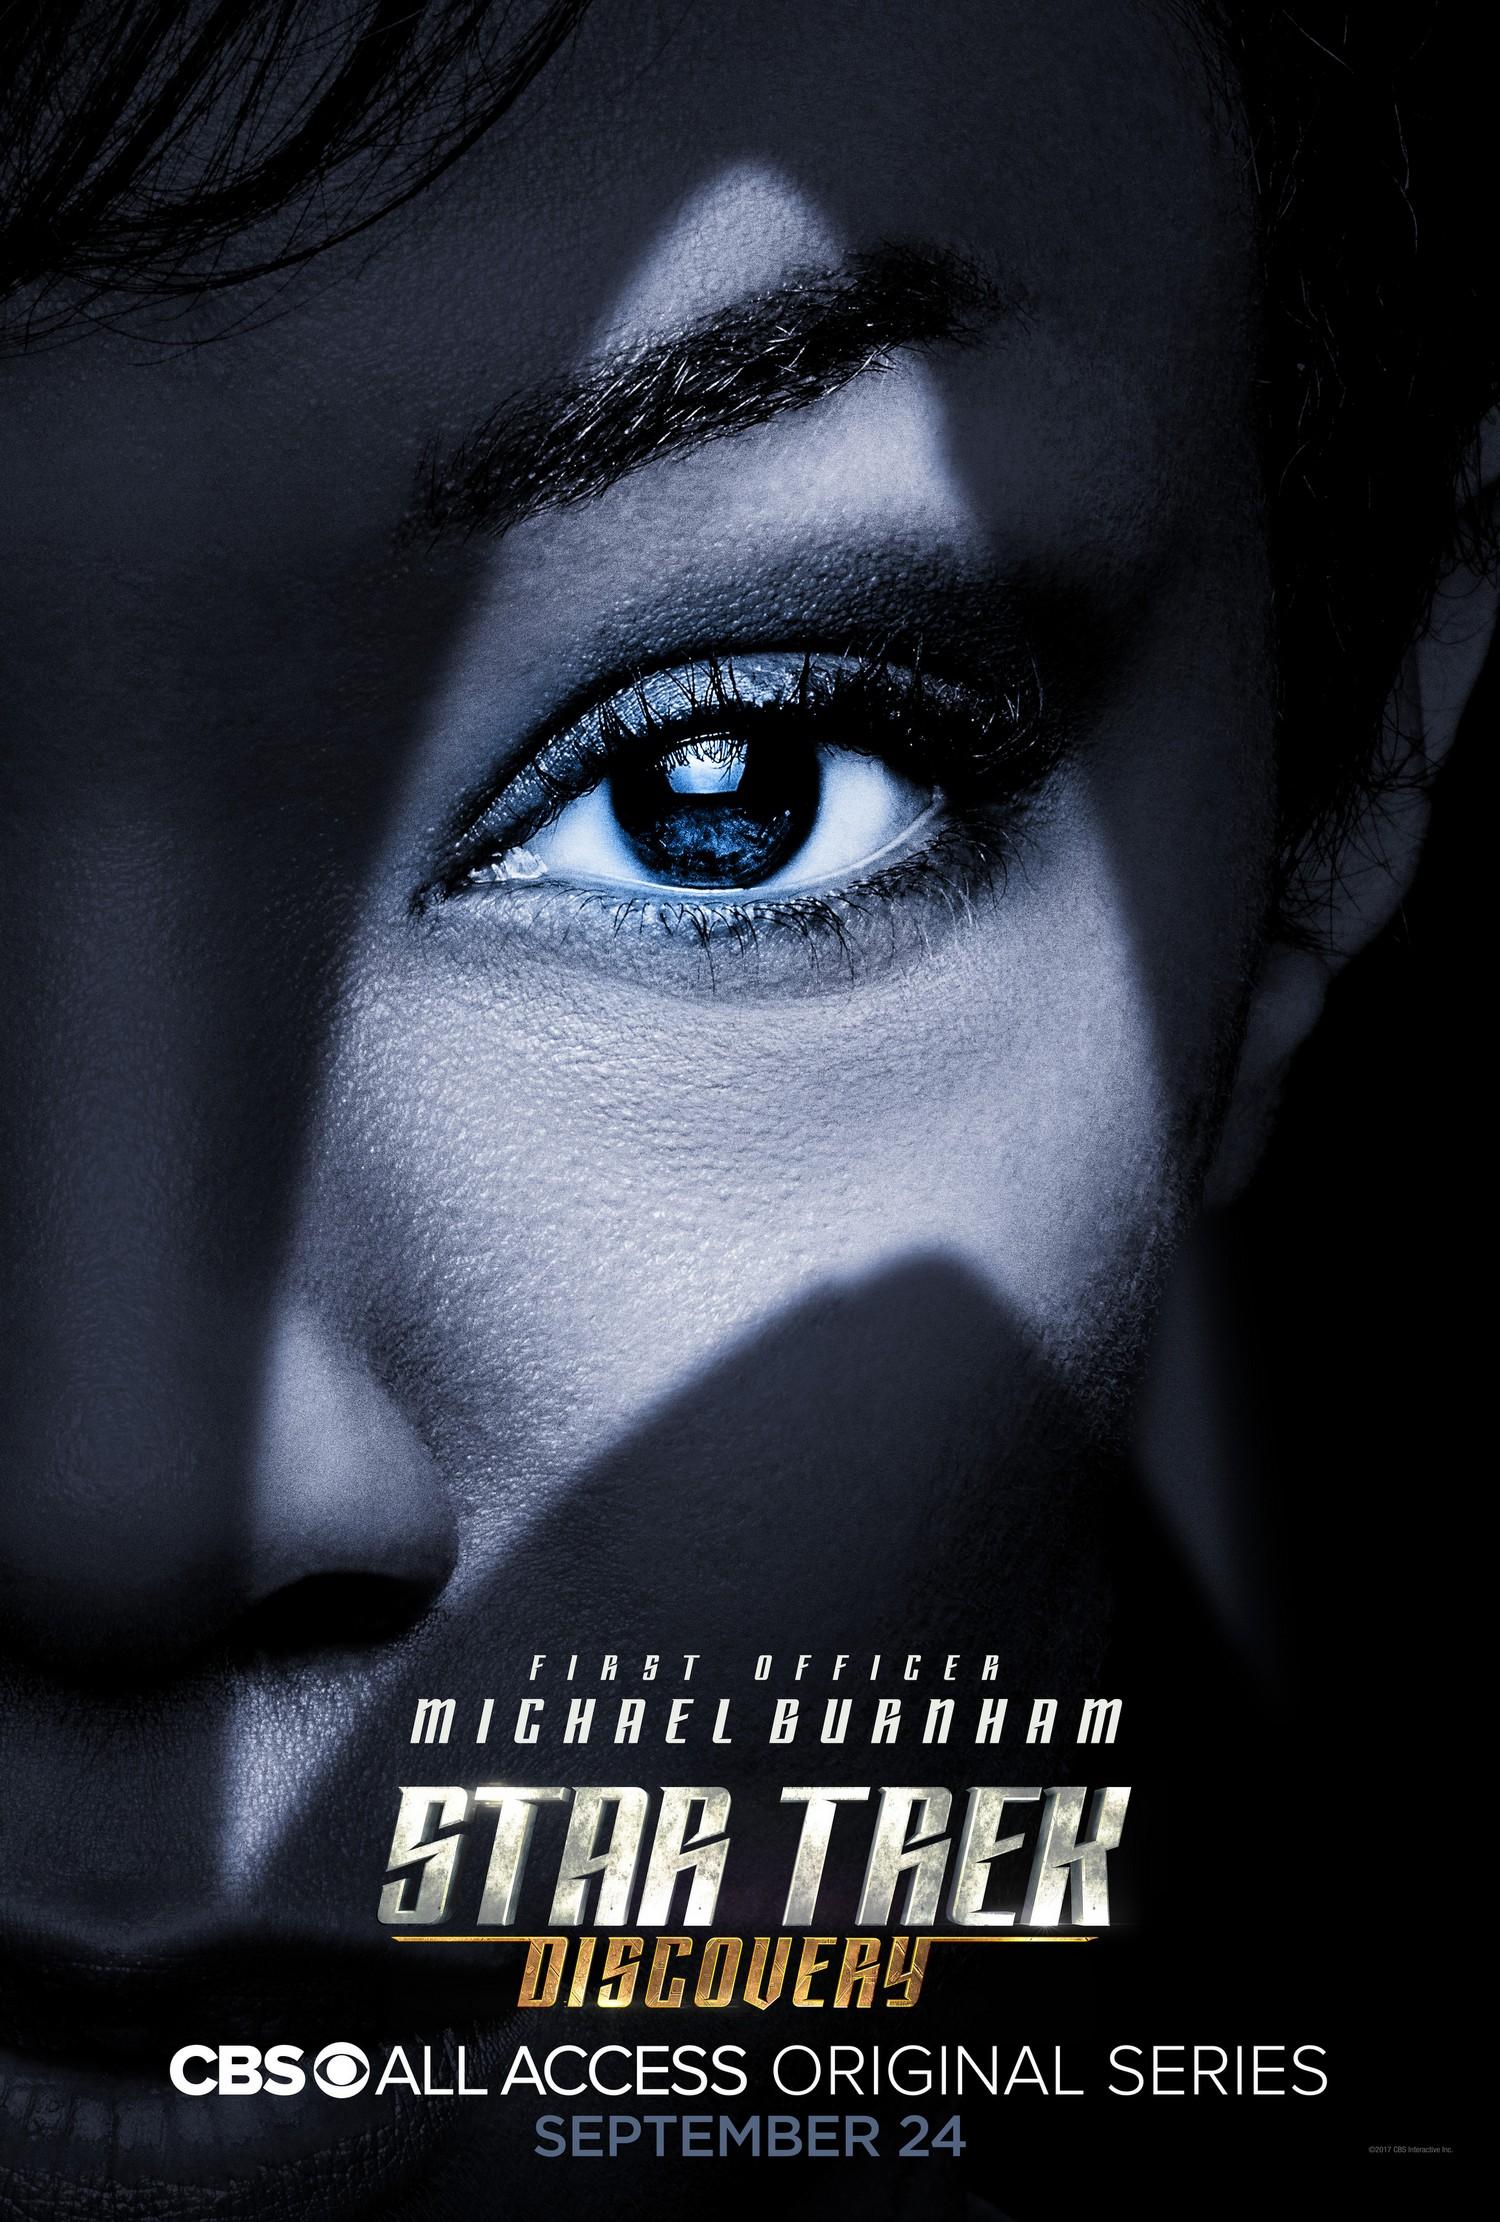 FileStar Trek Discovery Season 1 Michael Burnham Poster